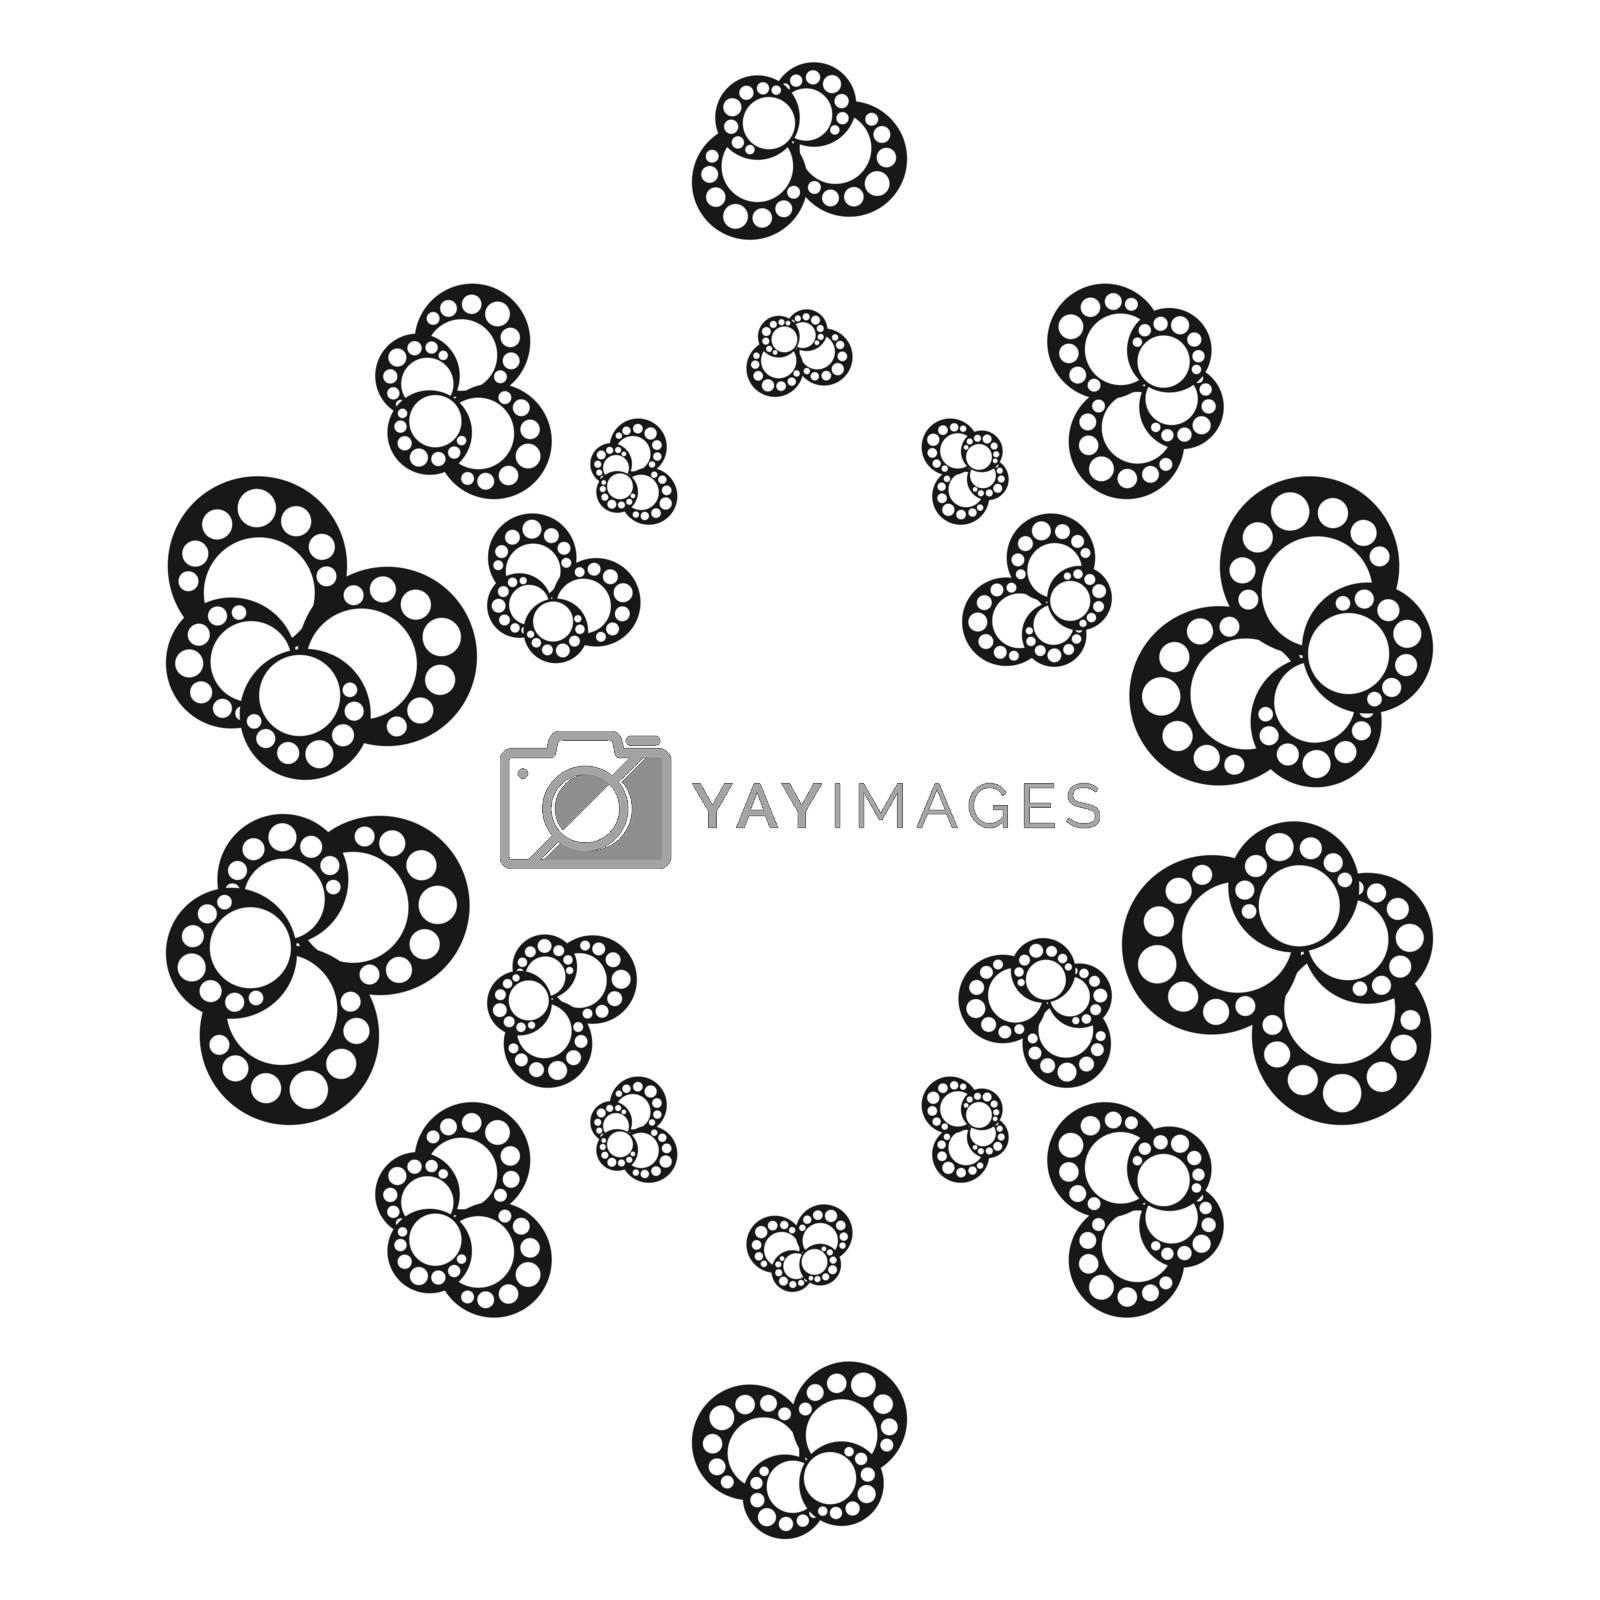 Abstract monochrome vector illustration